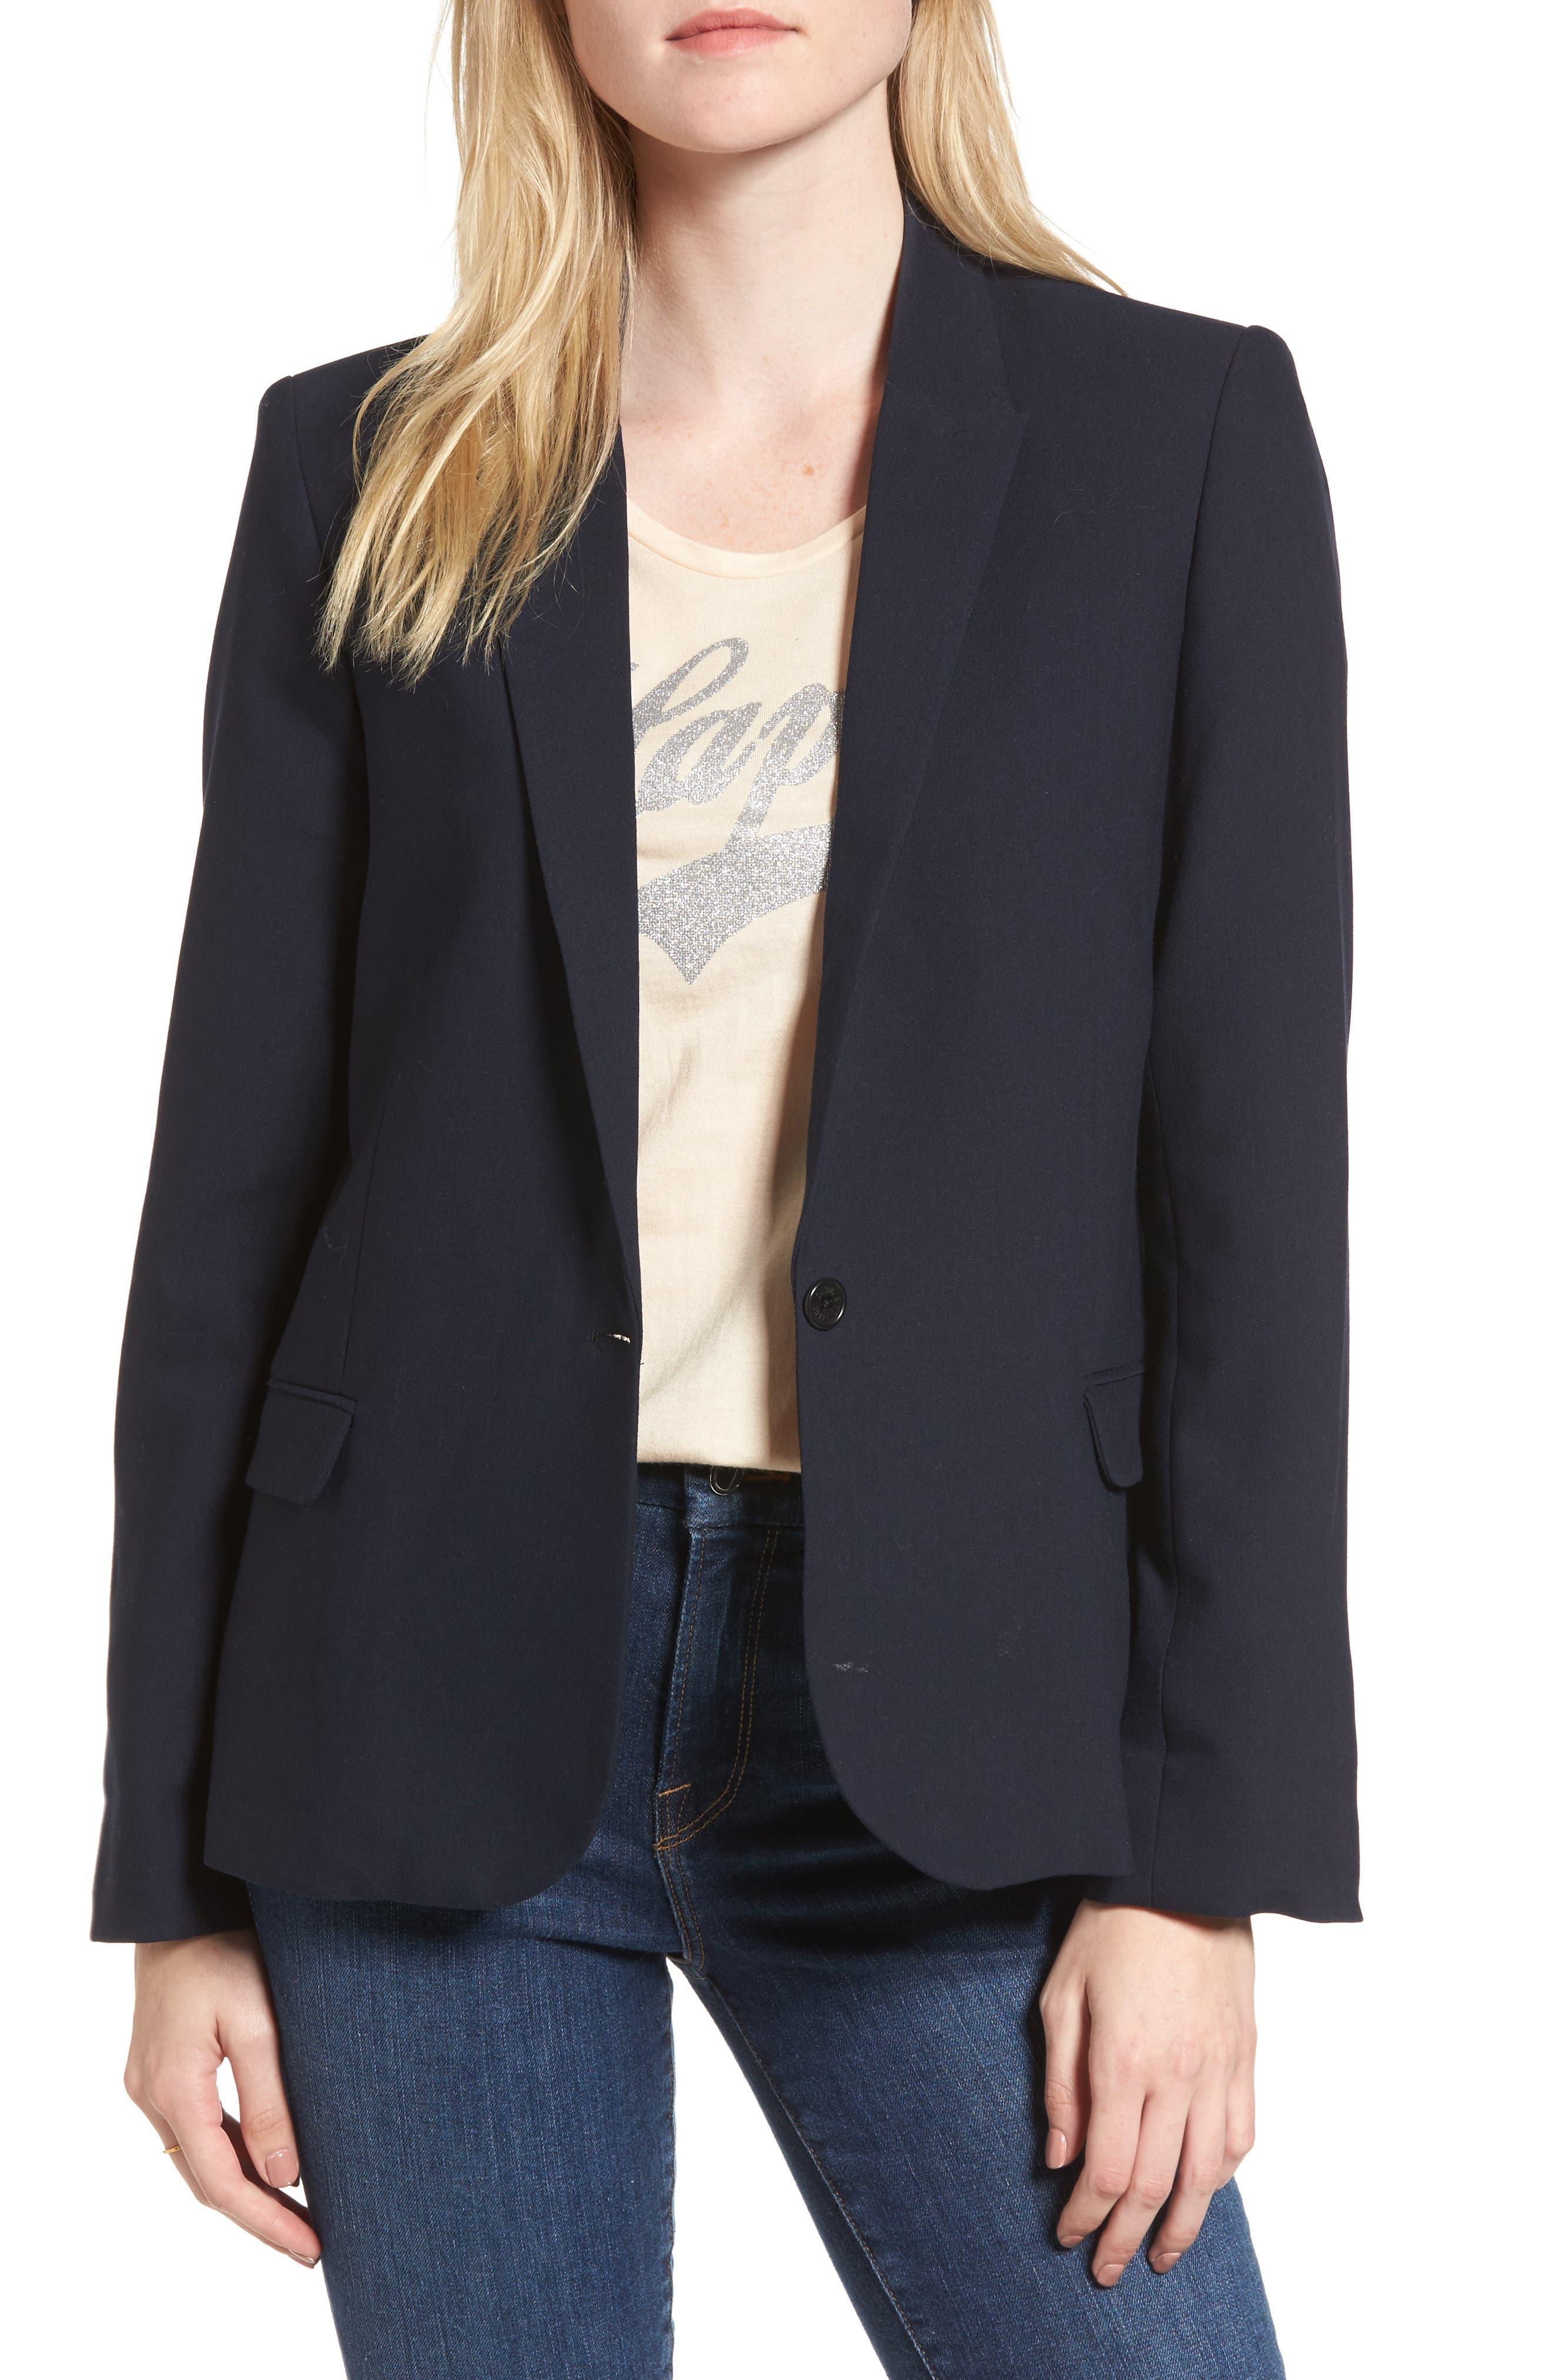 Alternate Image 1 Selected - Zadig & Voltaire Victor Love Bis Studded Jacket